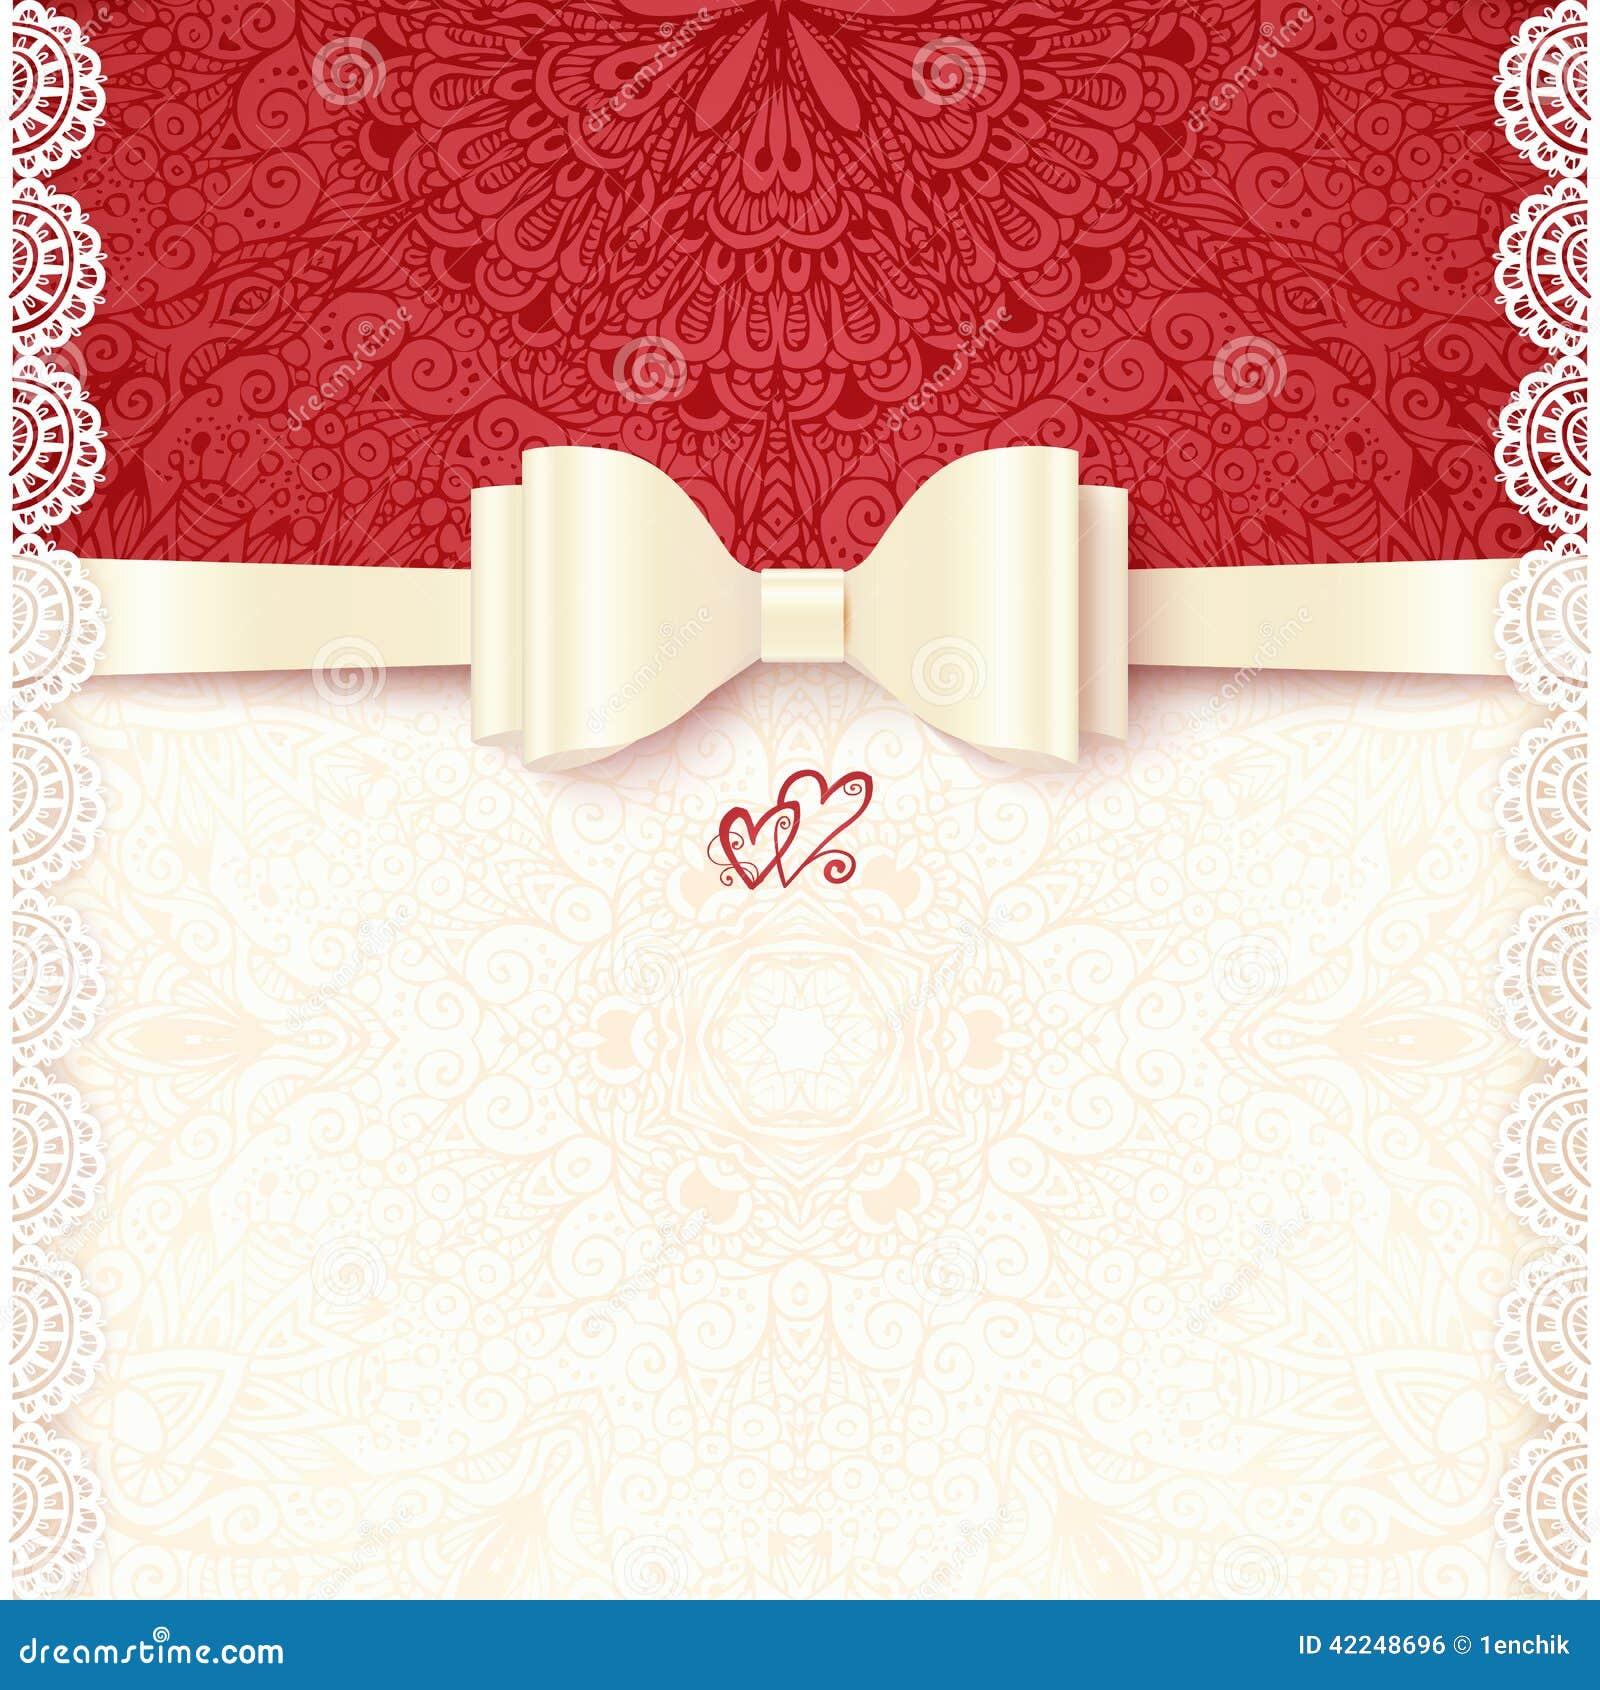 Wedding Invitation Editable Template is Elegant Layout To Make Beautiful Invitation Design